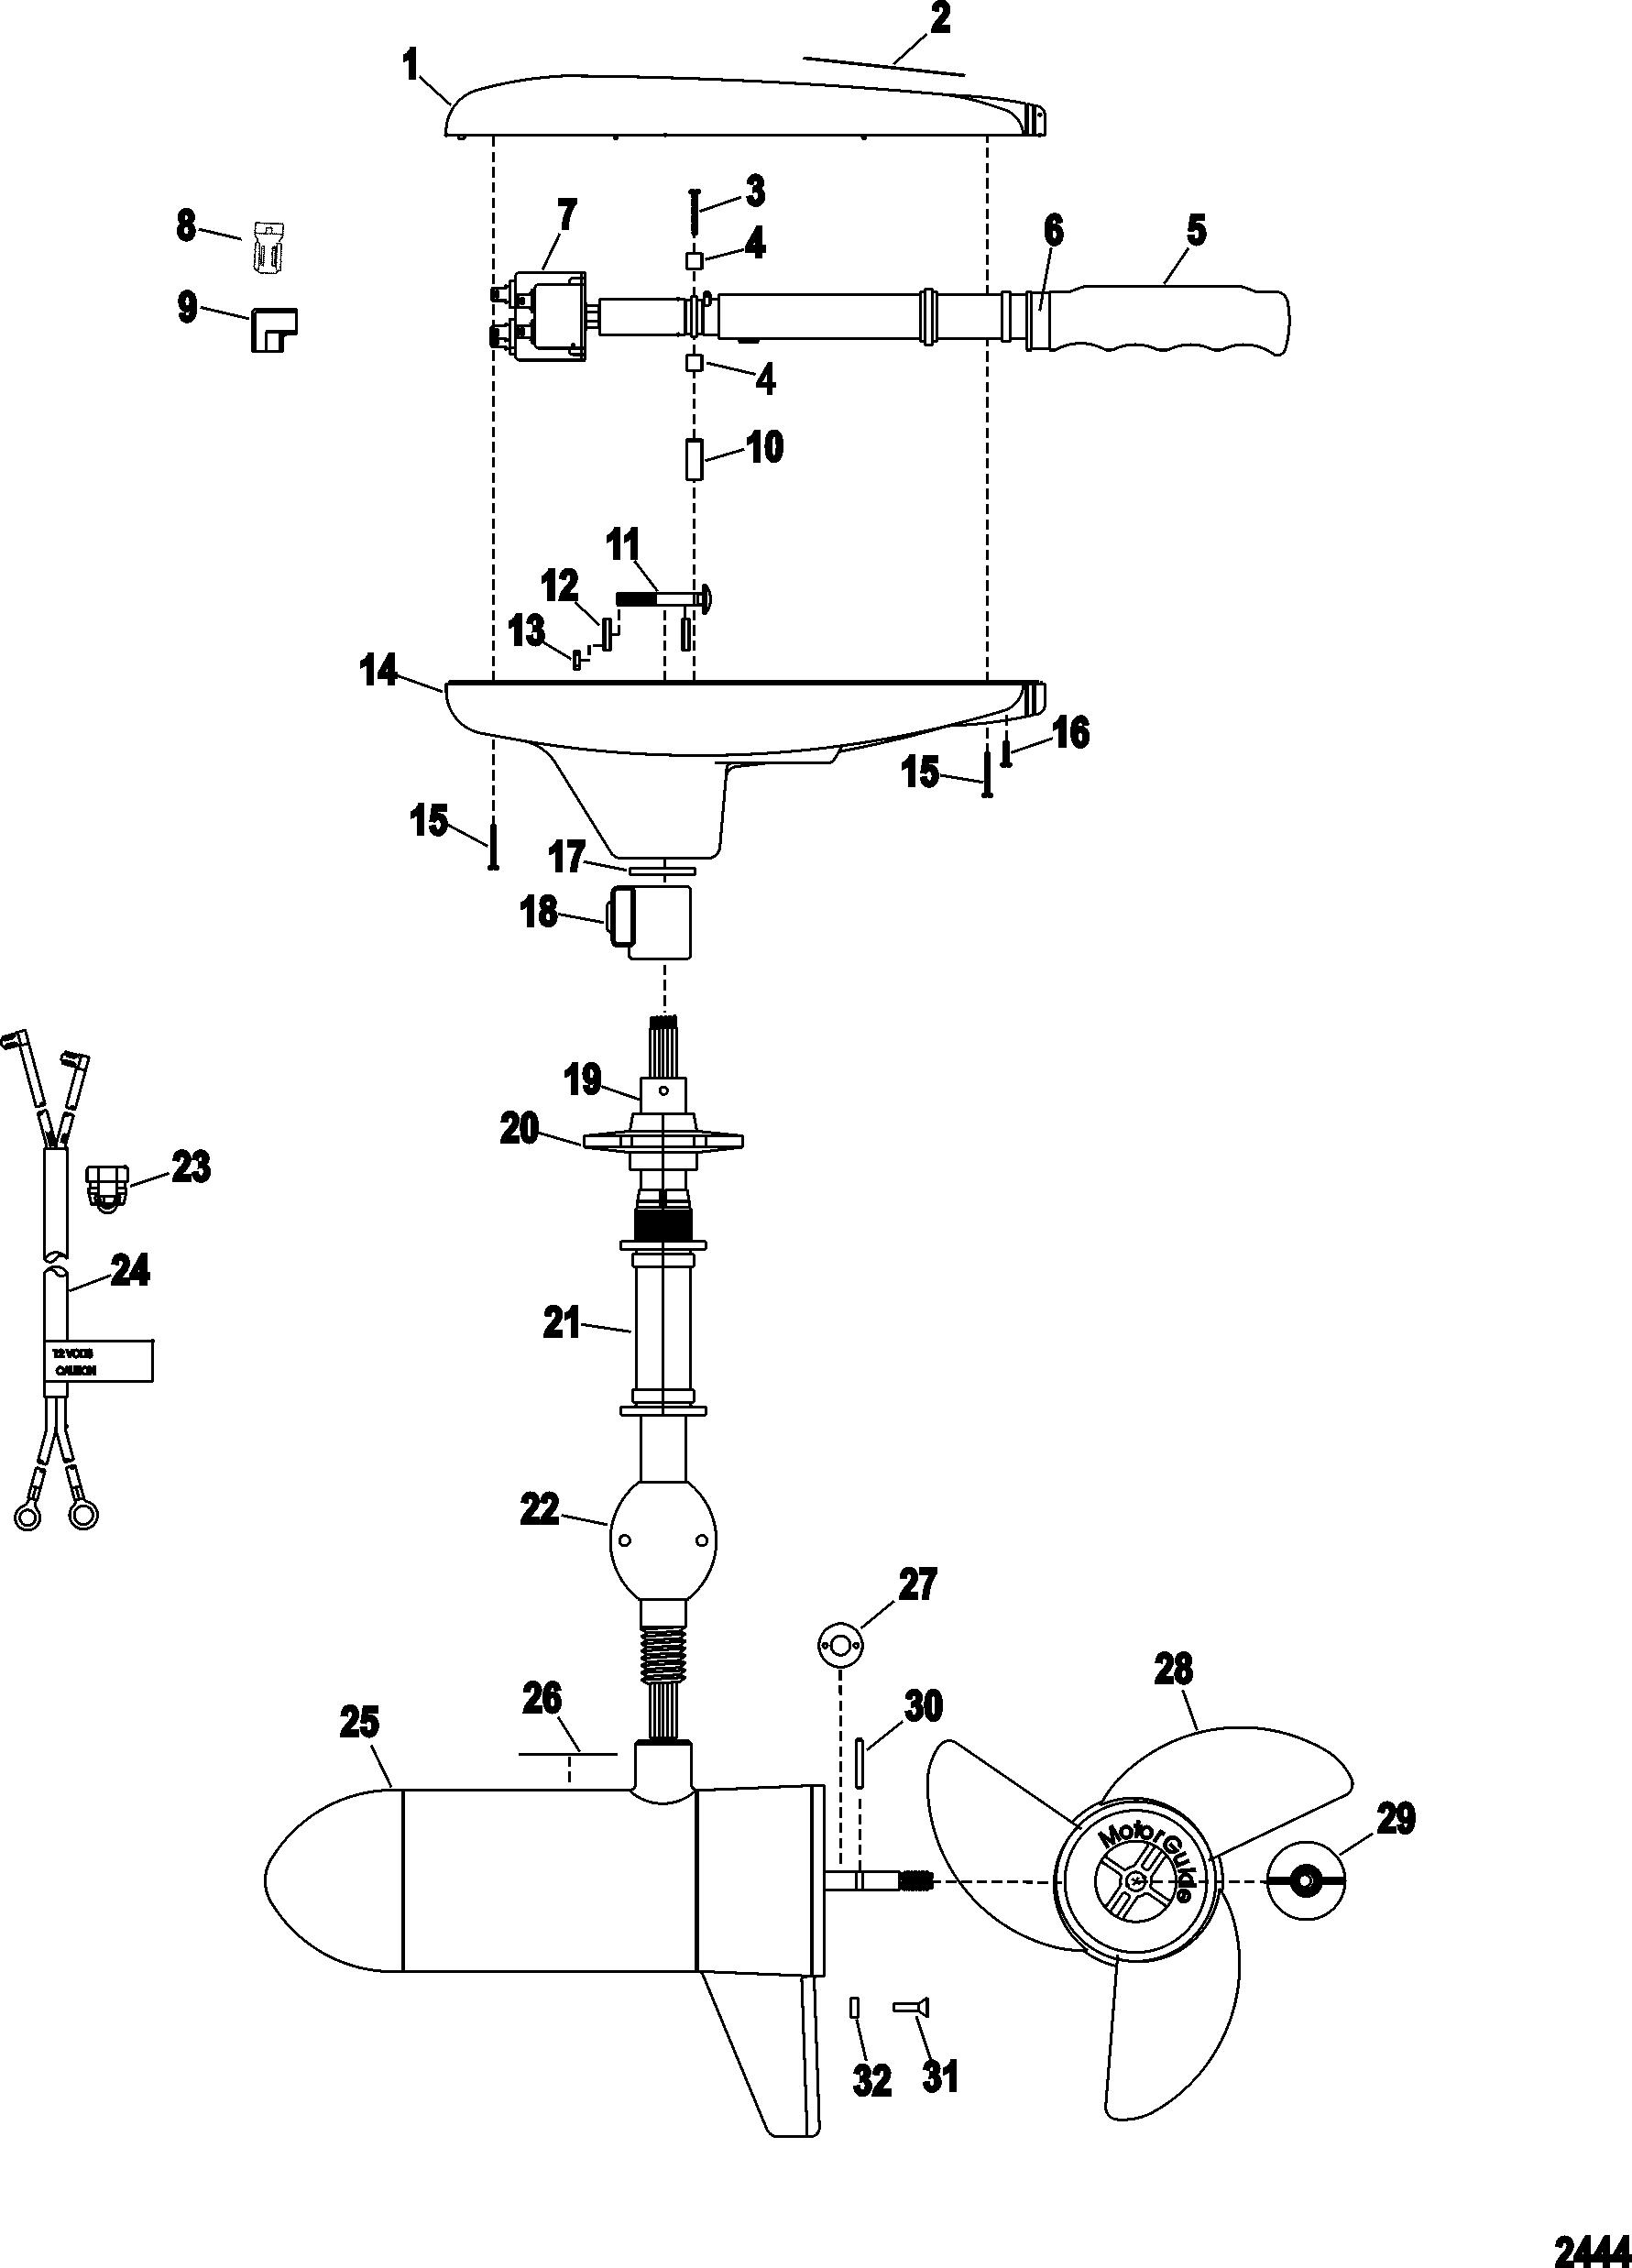 2444?resize=680%2C945&ssl=1 motorguide 3 prong wiring diagram minn kota wiring diagram, 24v motorguide 24v wiring diagram at bayanpartner.co